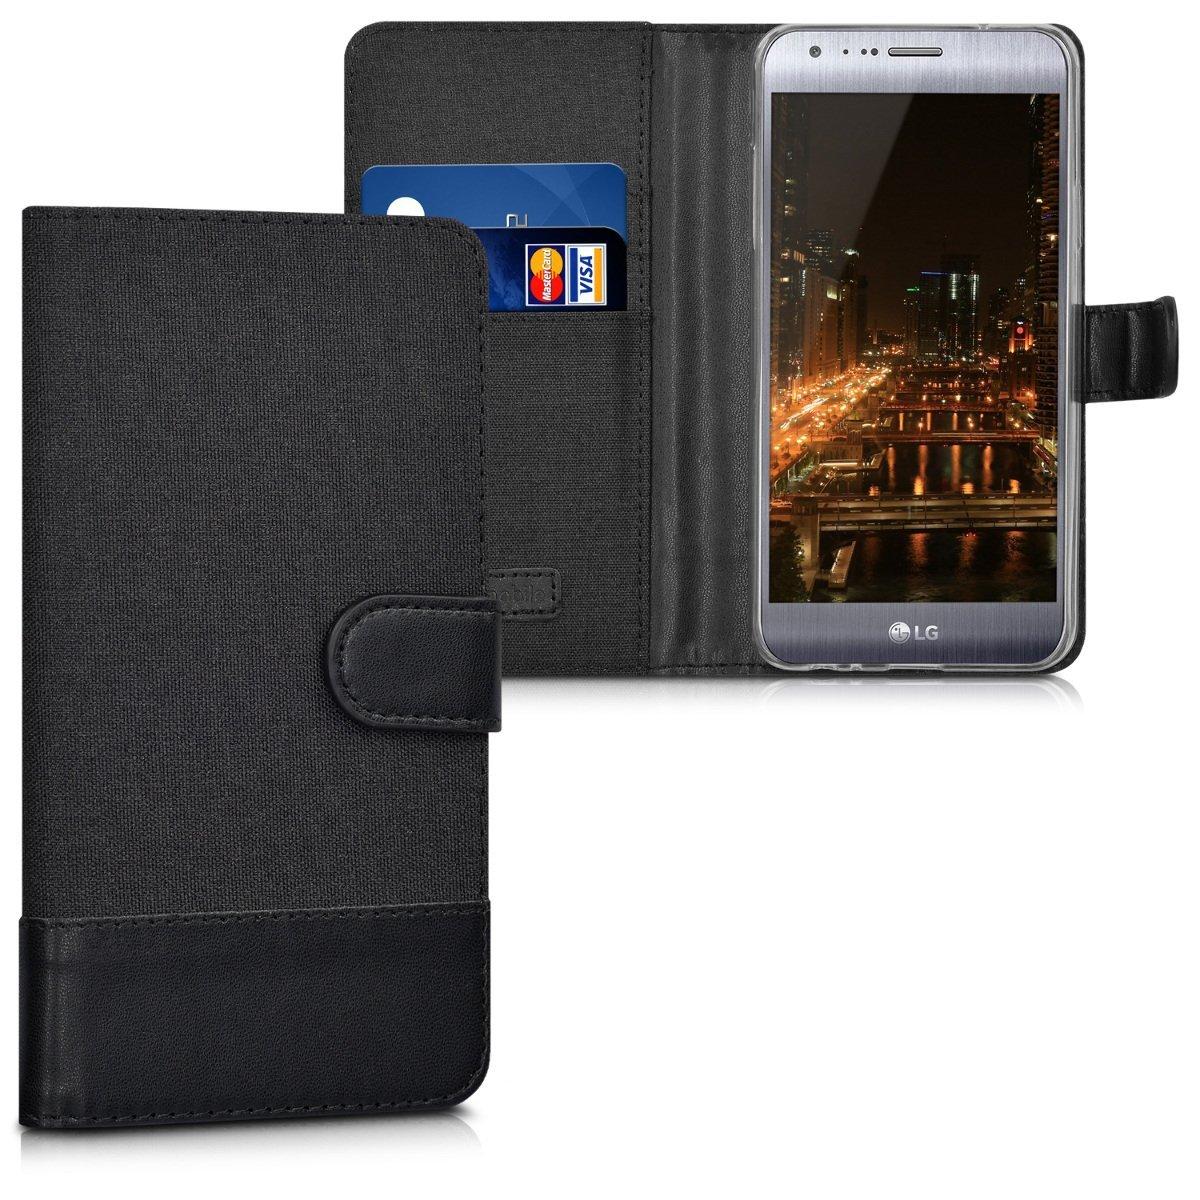 KW Θήκη - Πορτοφόλι LG X Cam - Anthracite/ Black (37211.73)